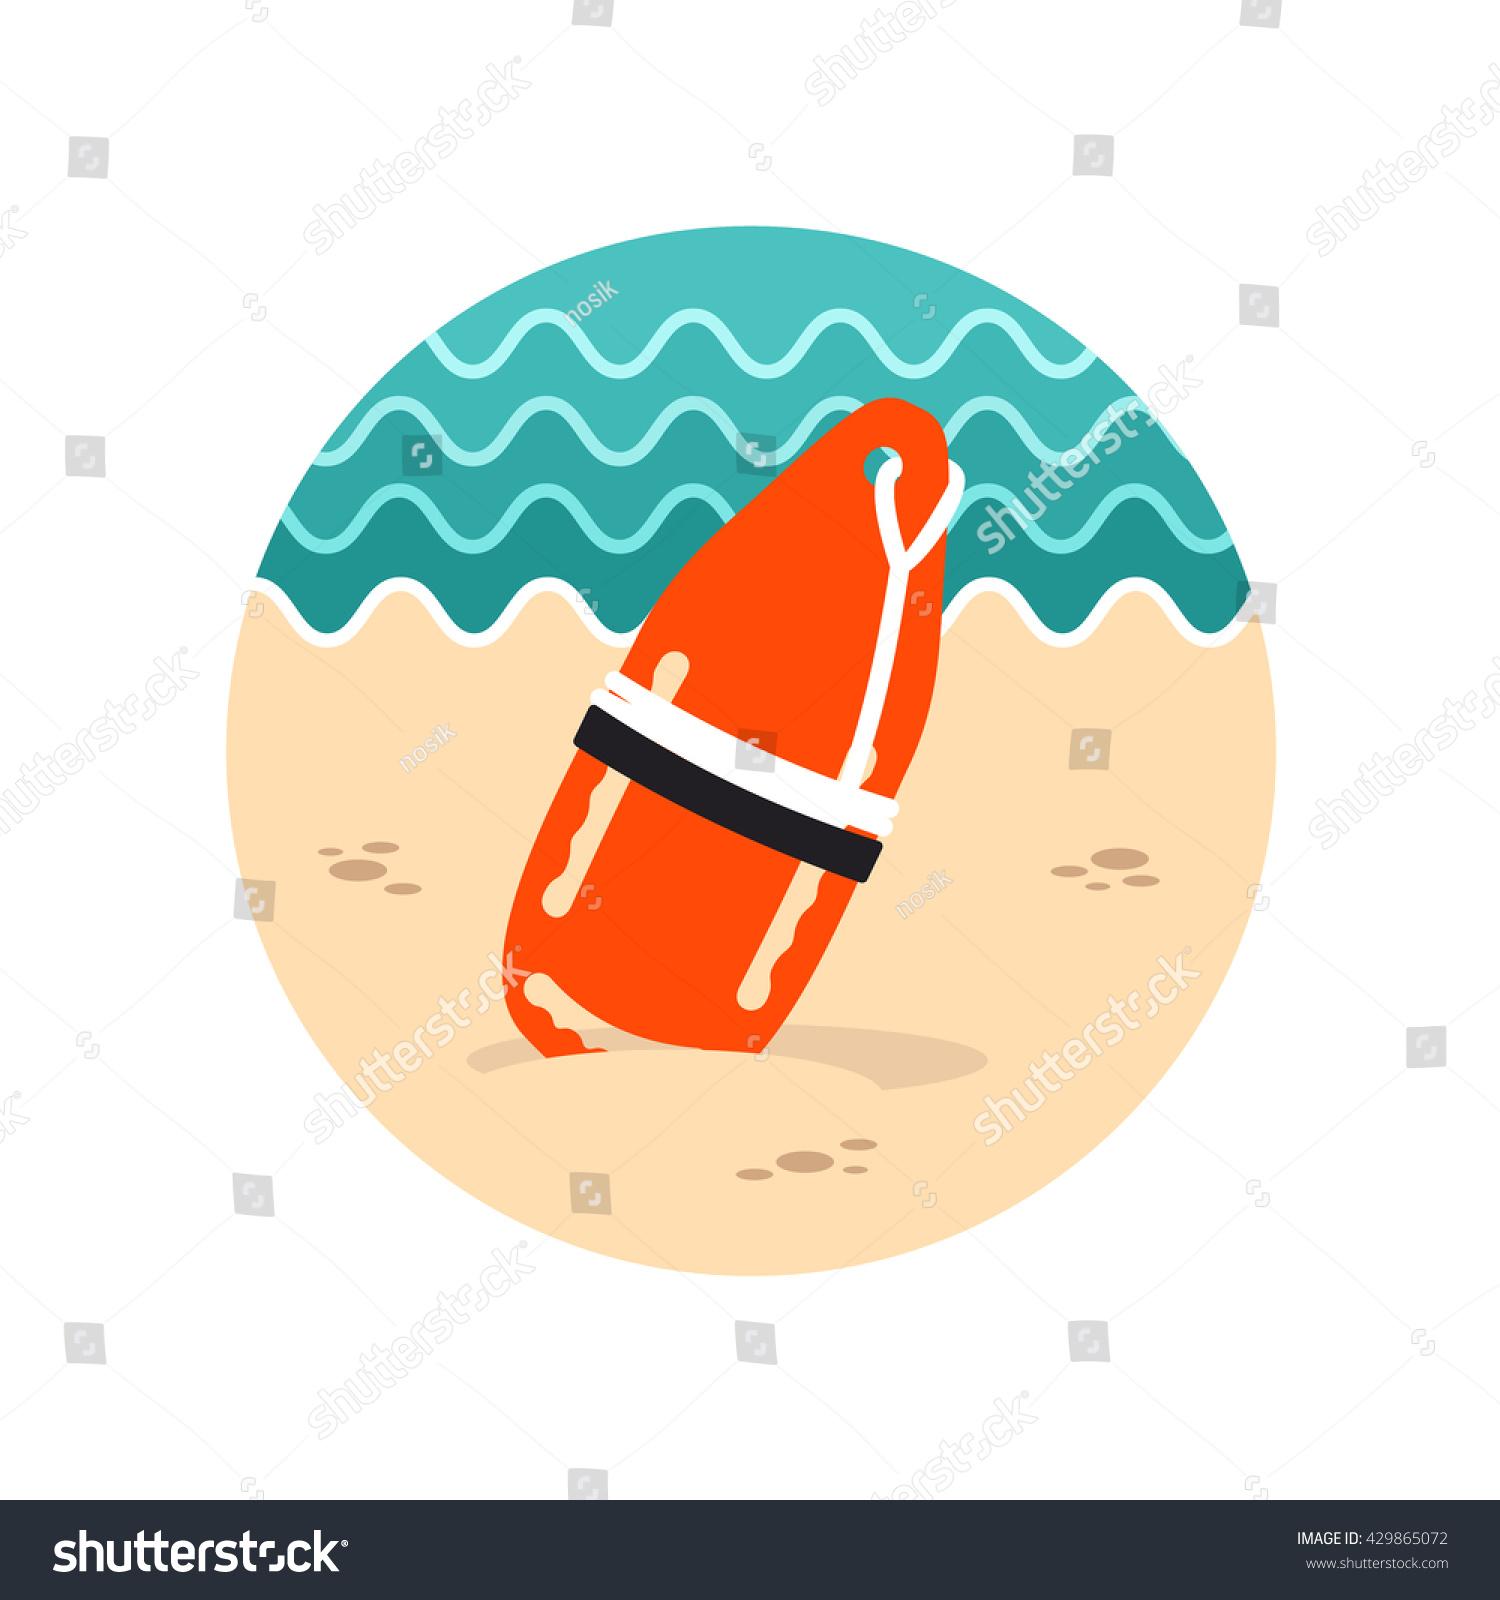 7a18a35b8e9d Support Help Assistance Torpedo Rescue Lifeguard Stock Vector ...